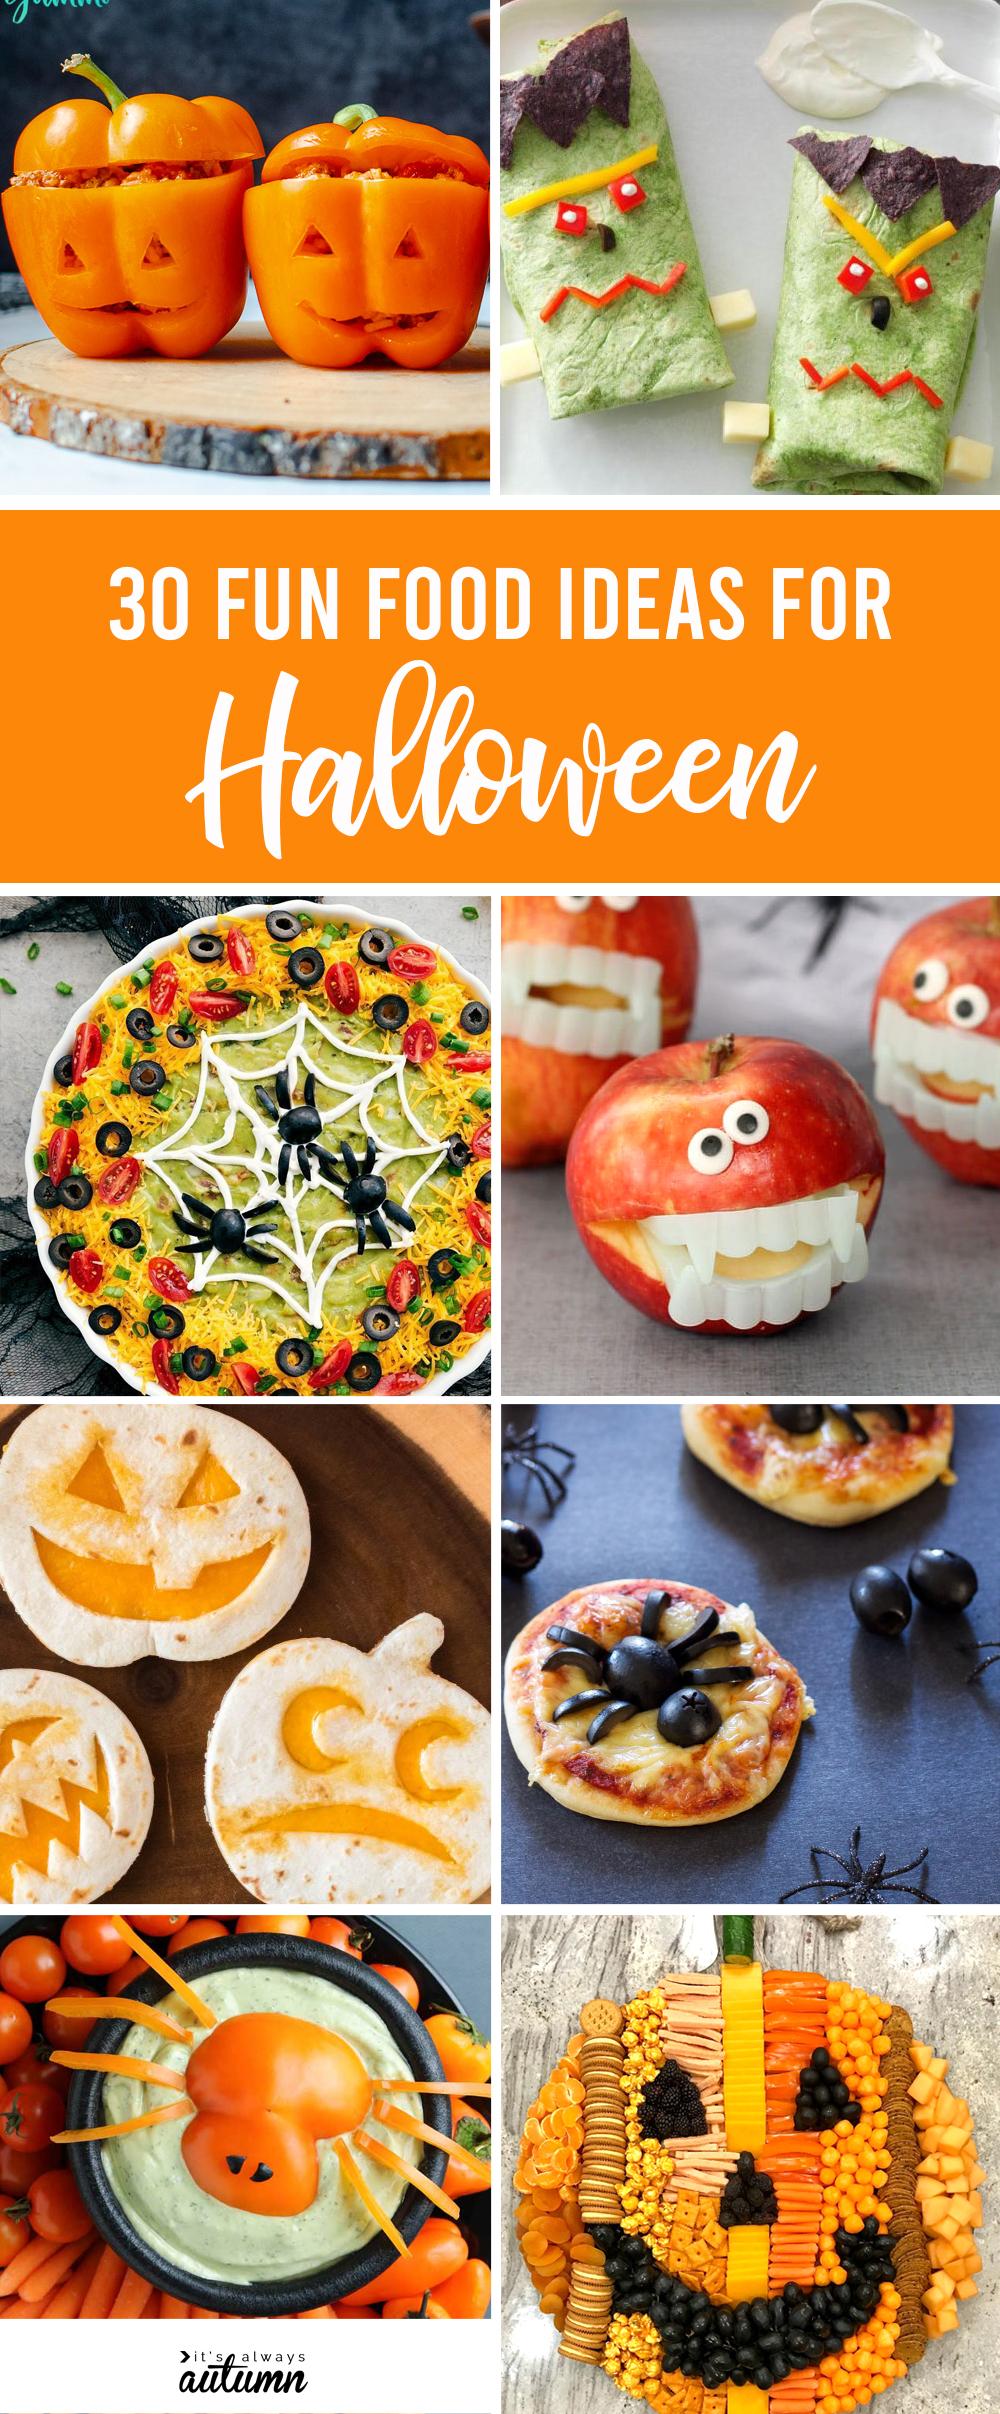 30 adorable Halloween food ideas